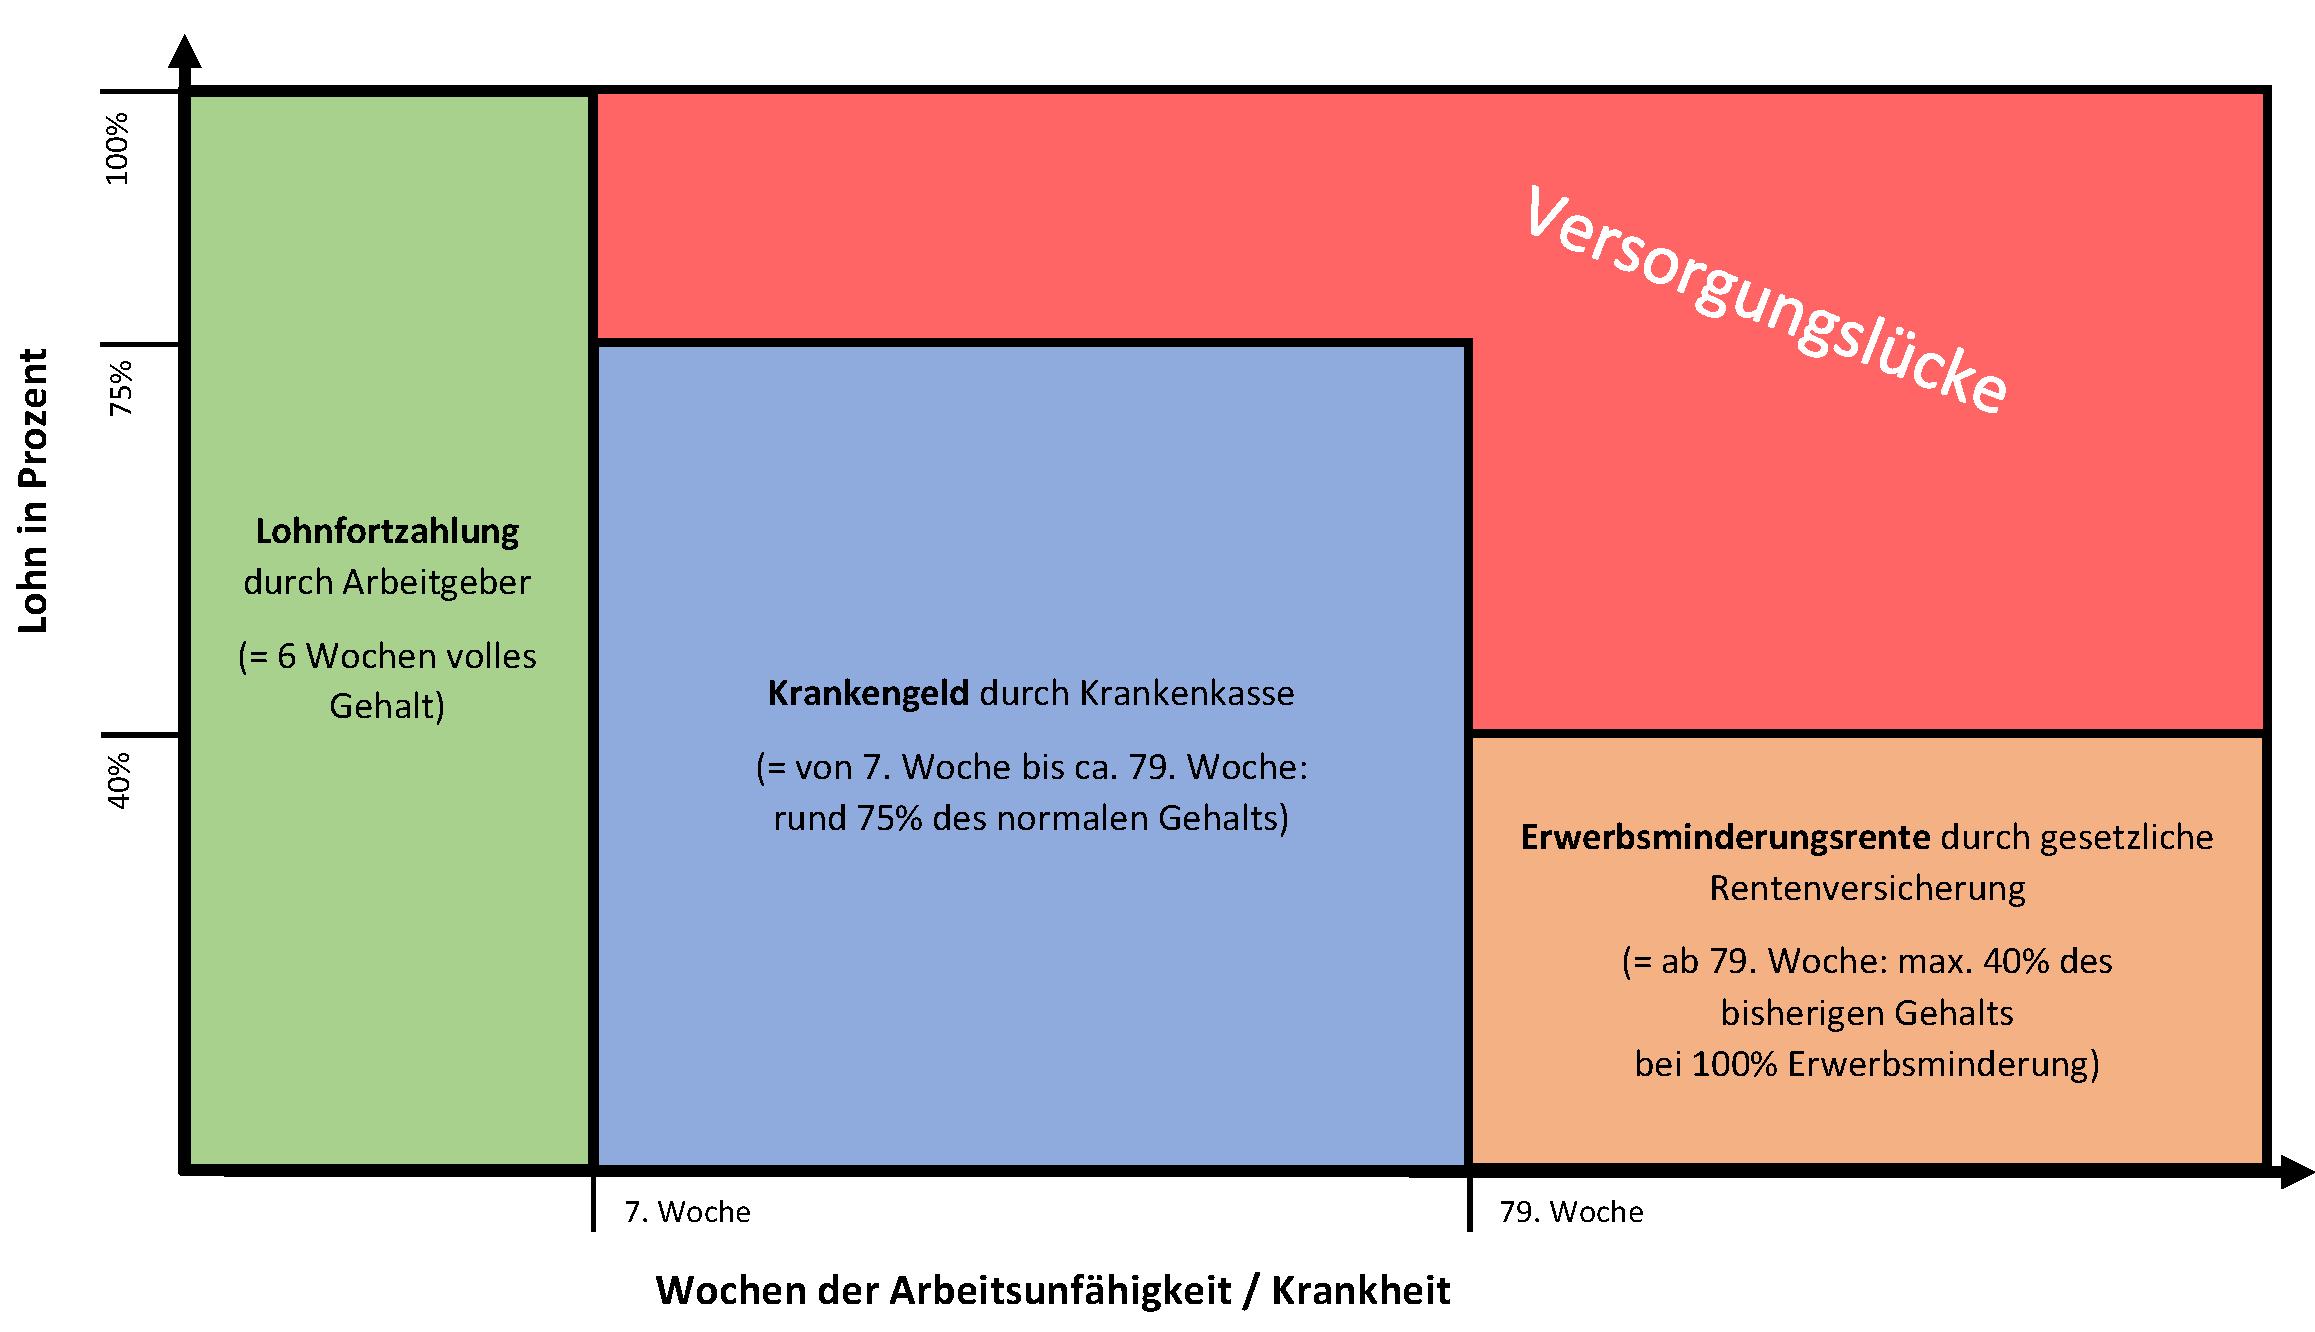 leil.de/di/pics/versorgungsluecke_rentenluecke_dasinternet.png